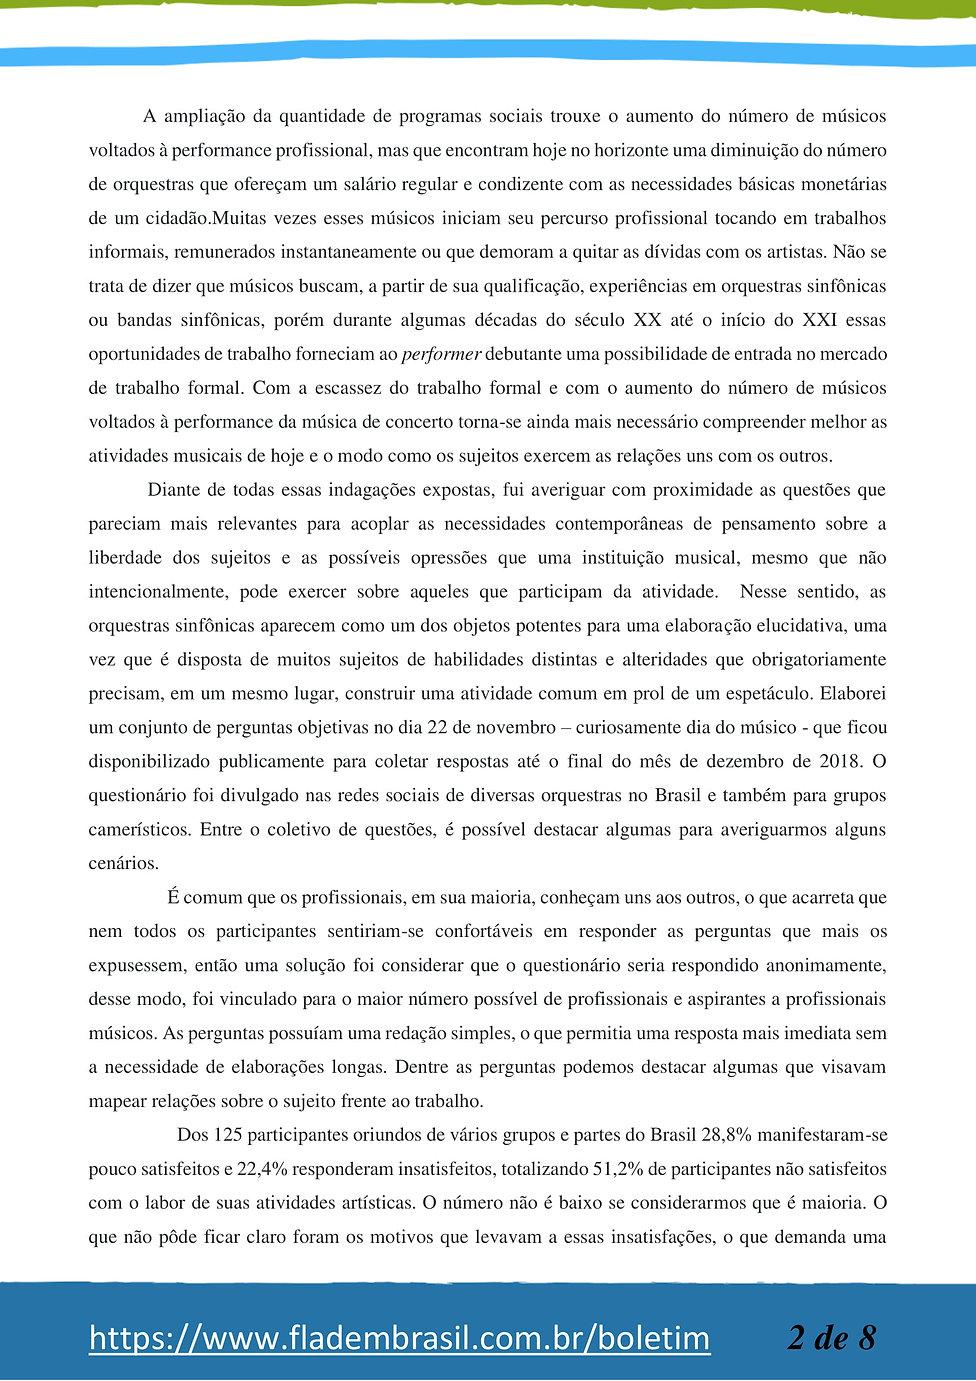 Boletim 02 diagramado - Hudson Lima-2.jp